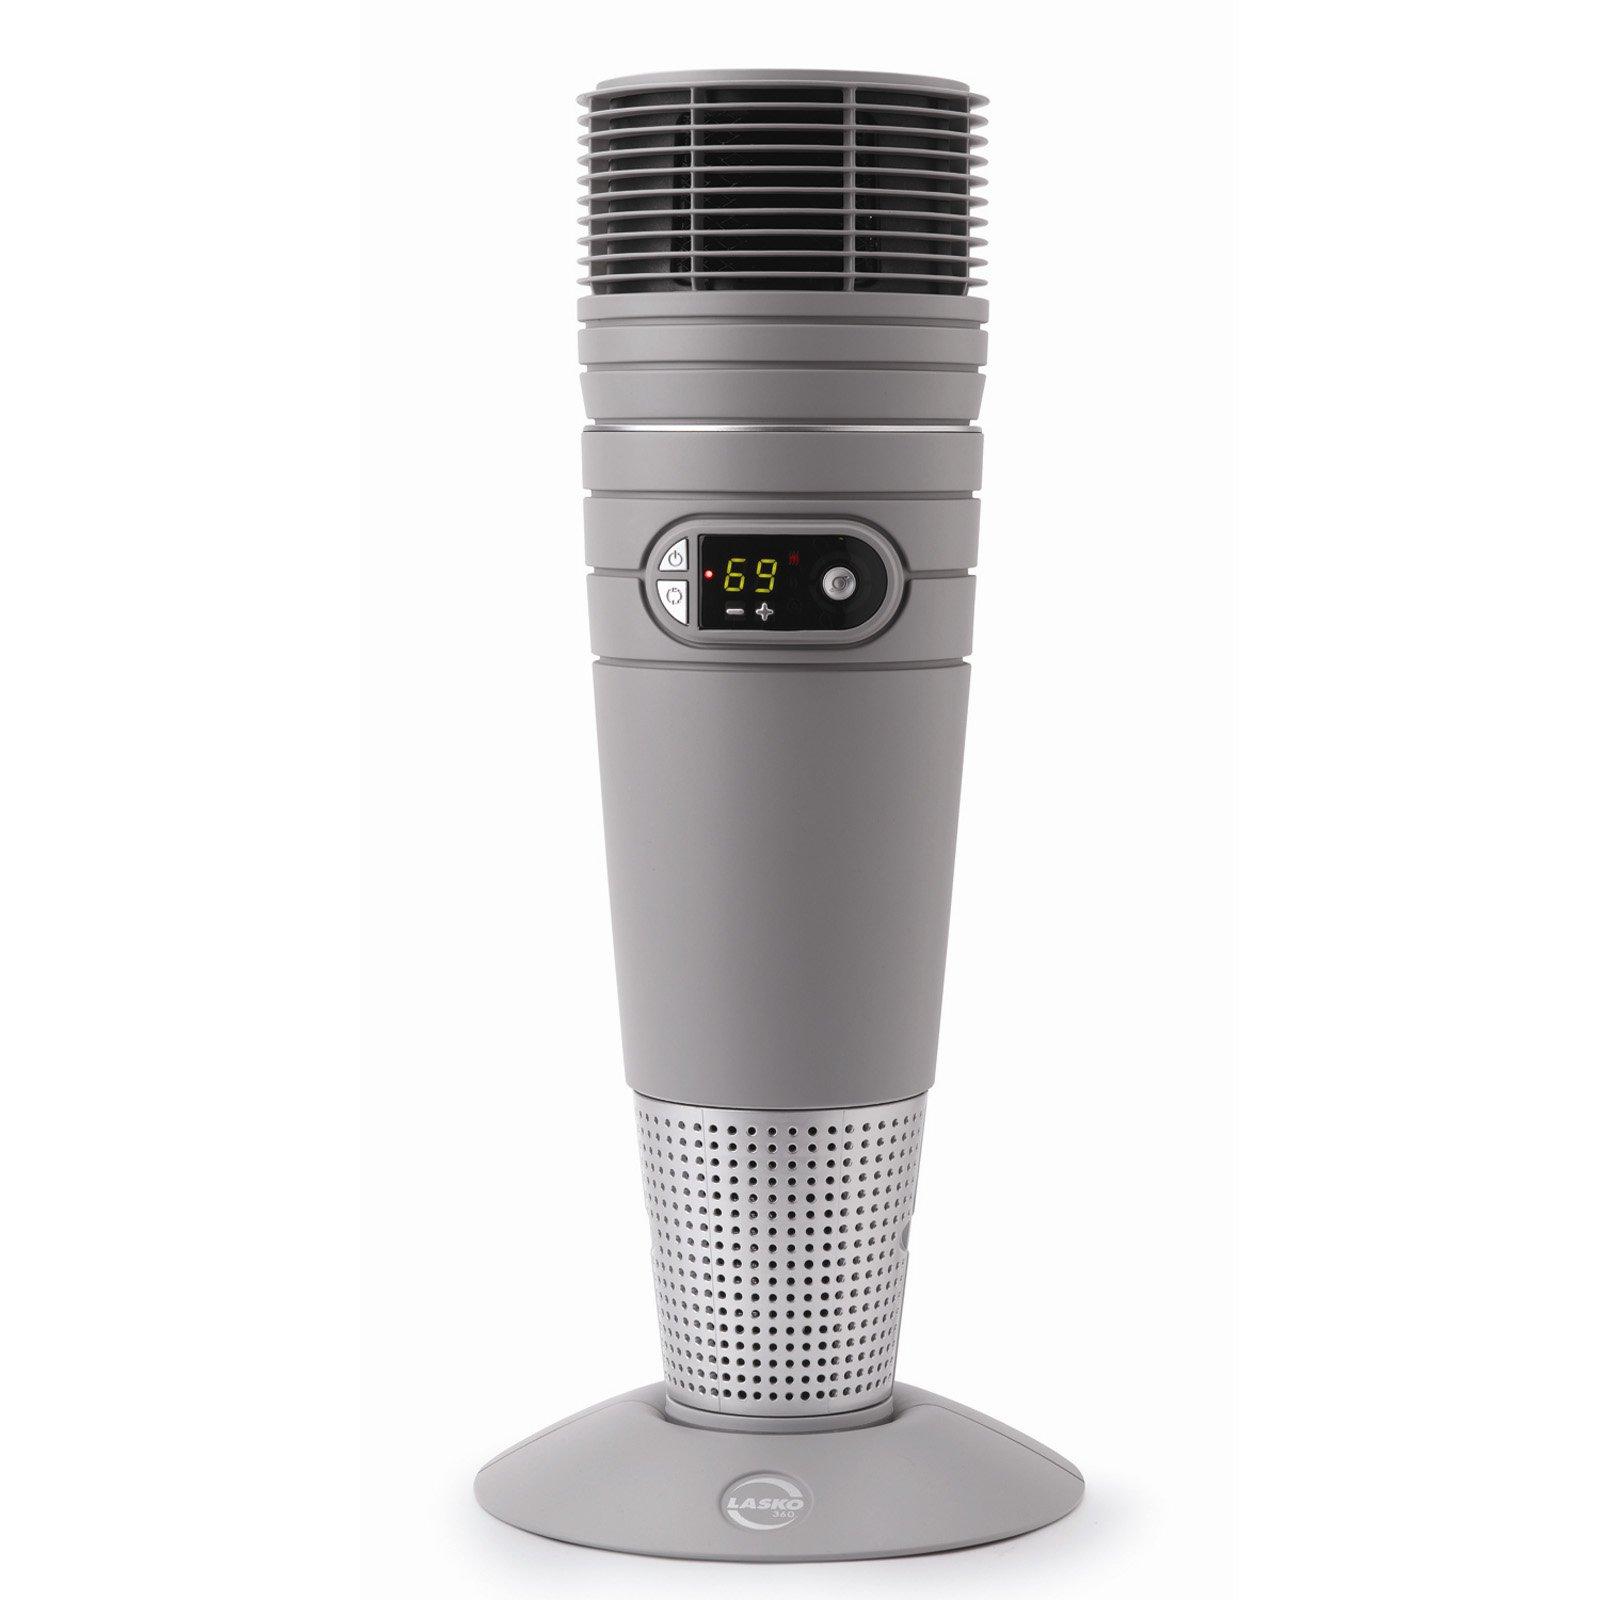 Lasko Electric Full Circle Warmth Ceramic Heater,  6462